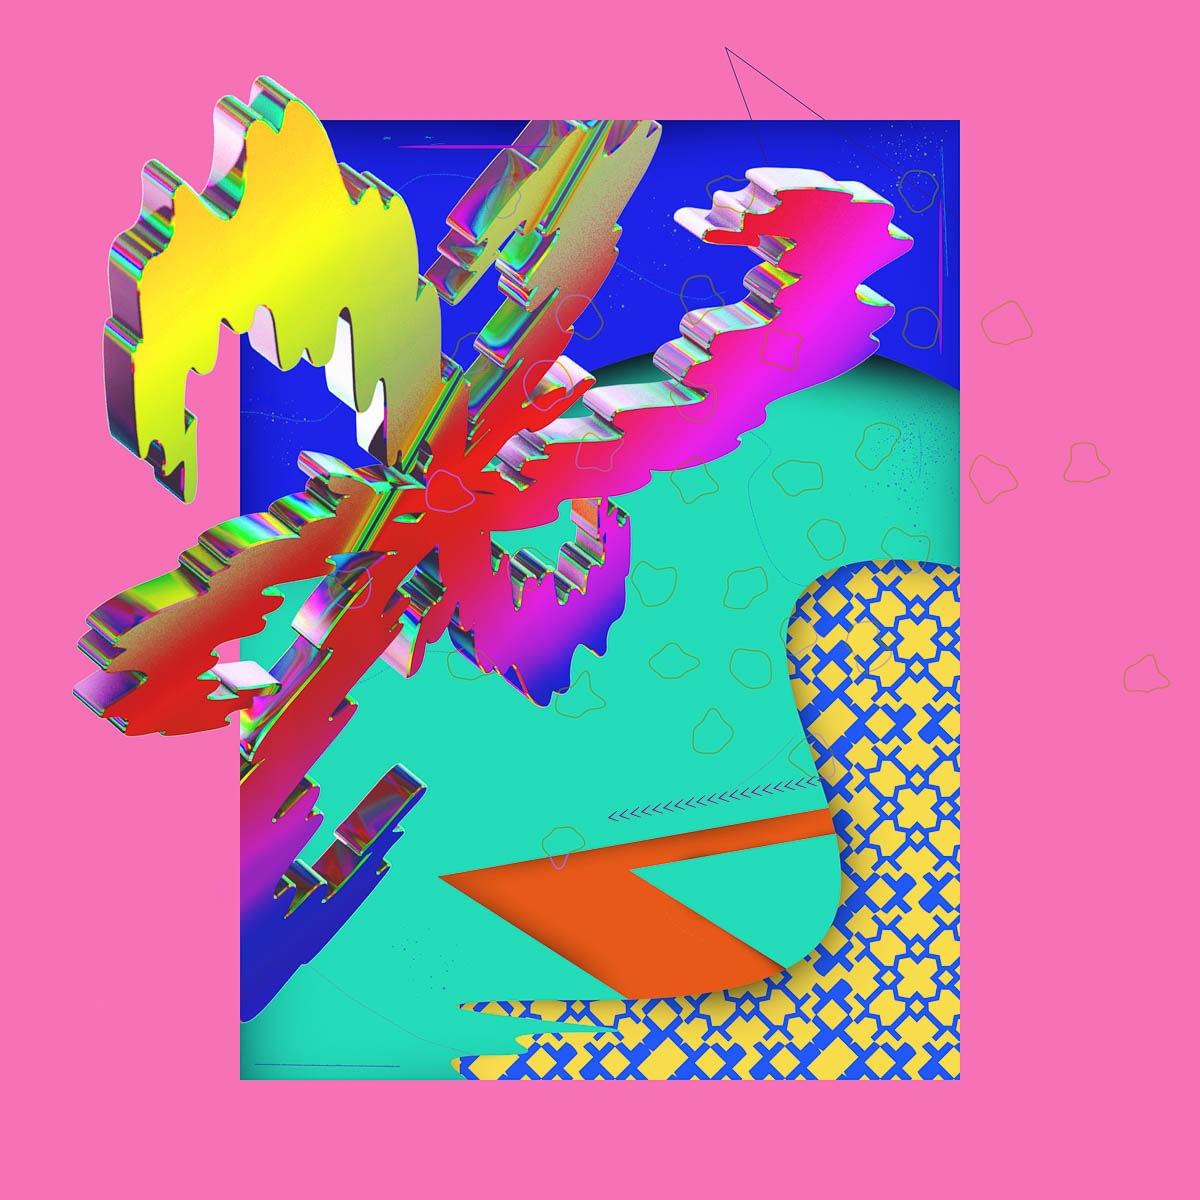 Design 31 – Change The Game